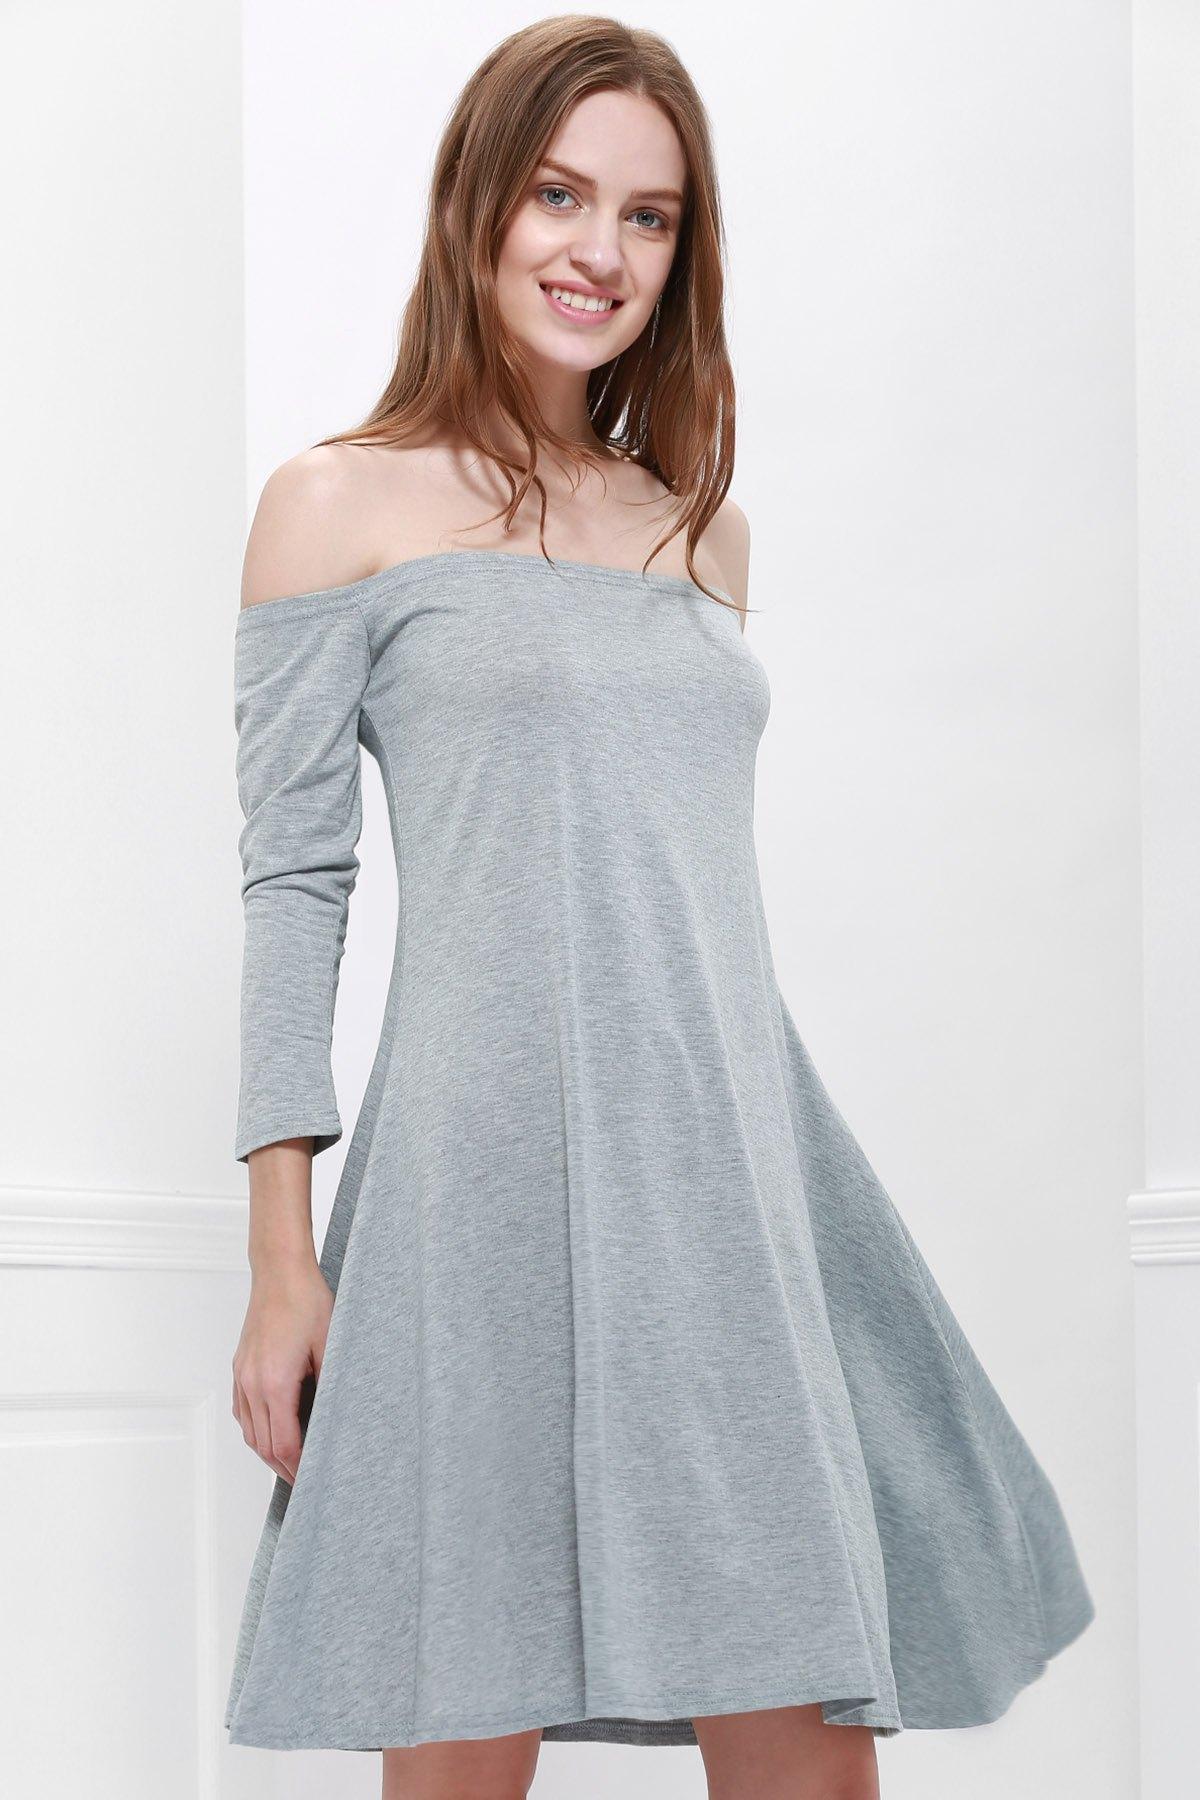 Slash Neck Long Sleeve Gray Dress